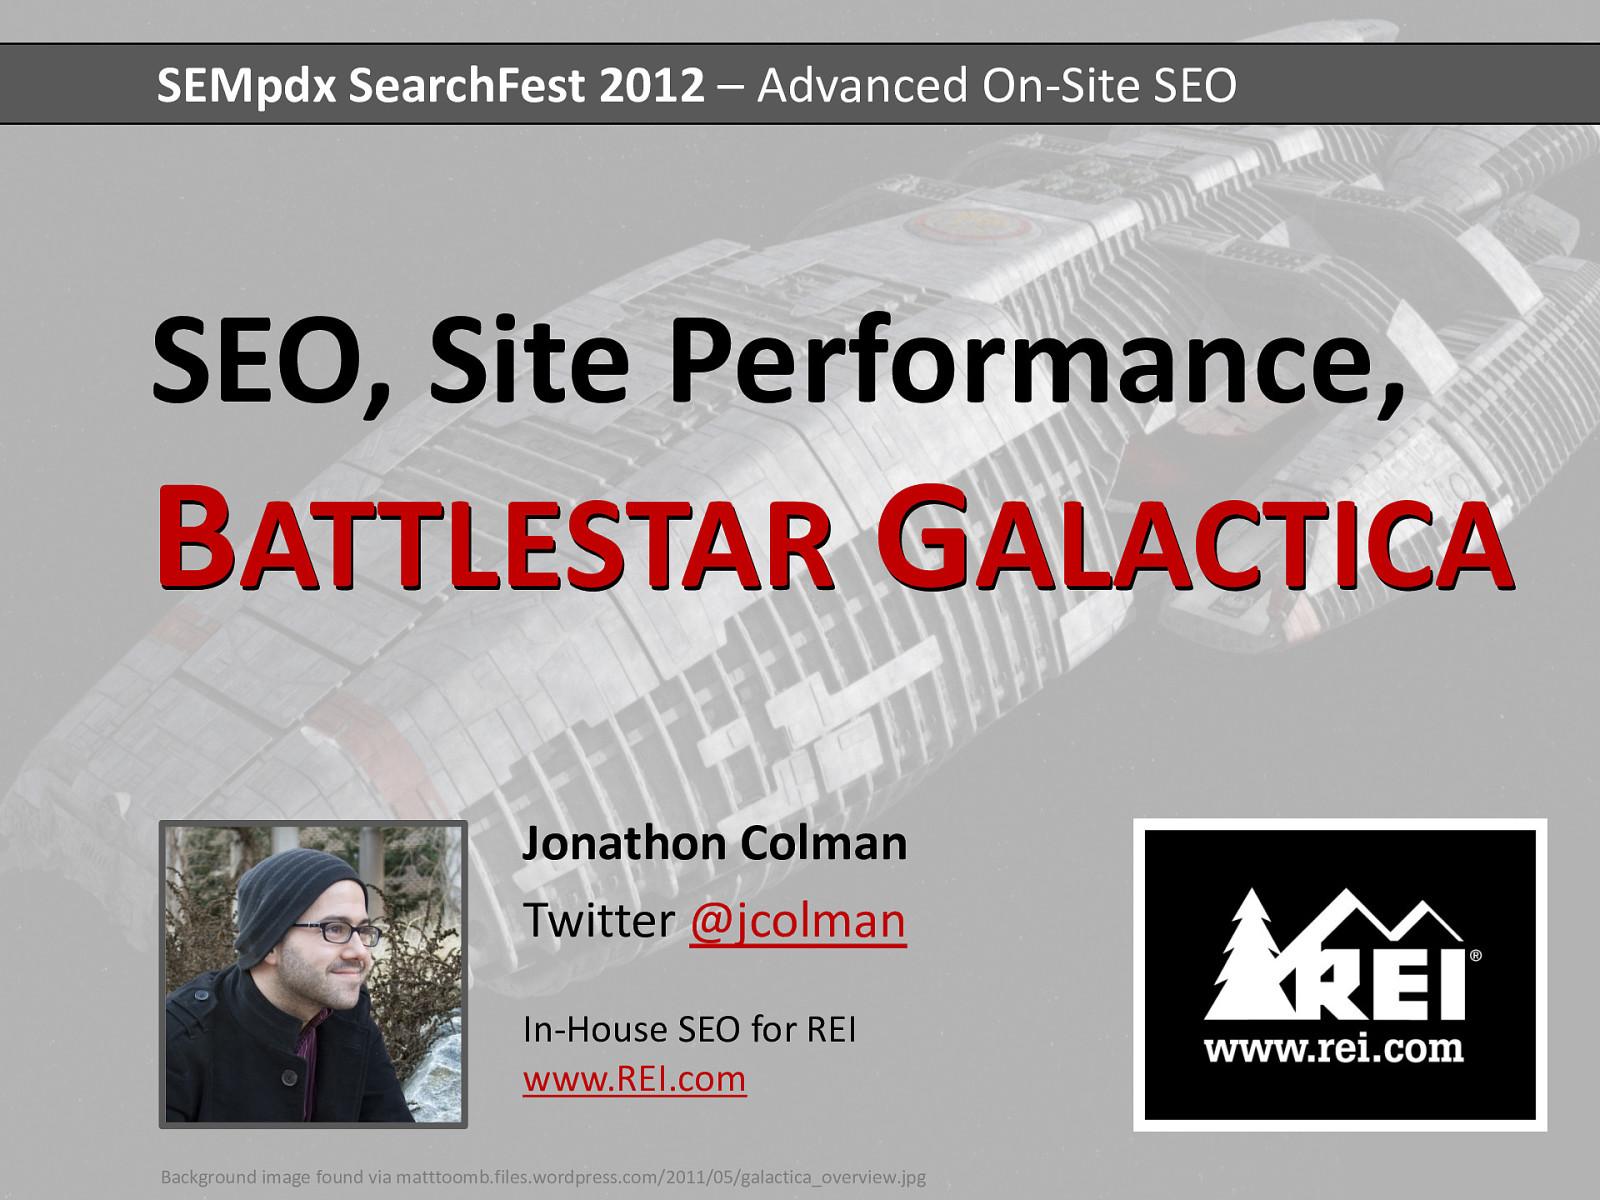 SEO, Site Speed, and Battlestar Galactica